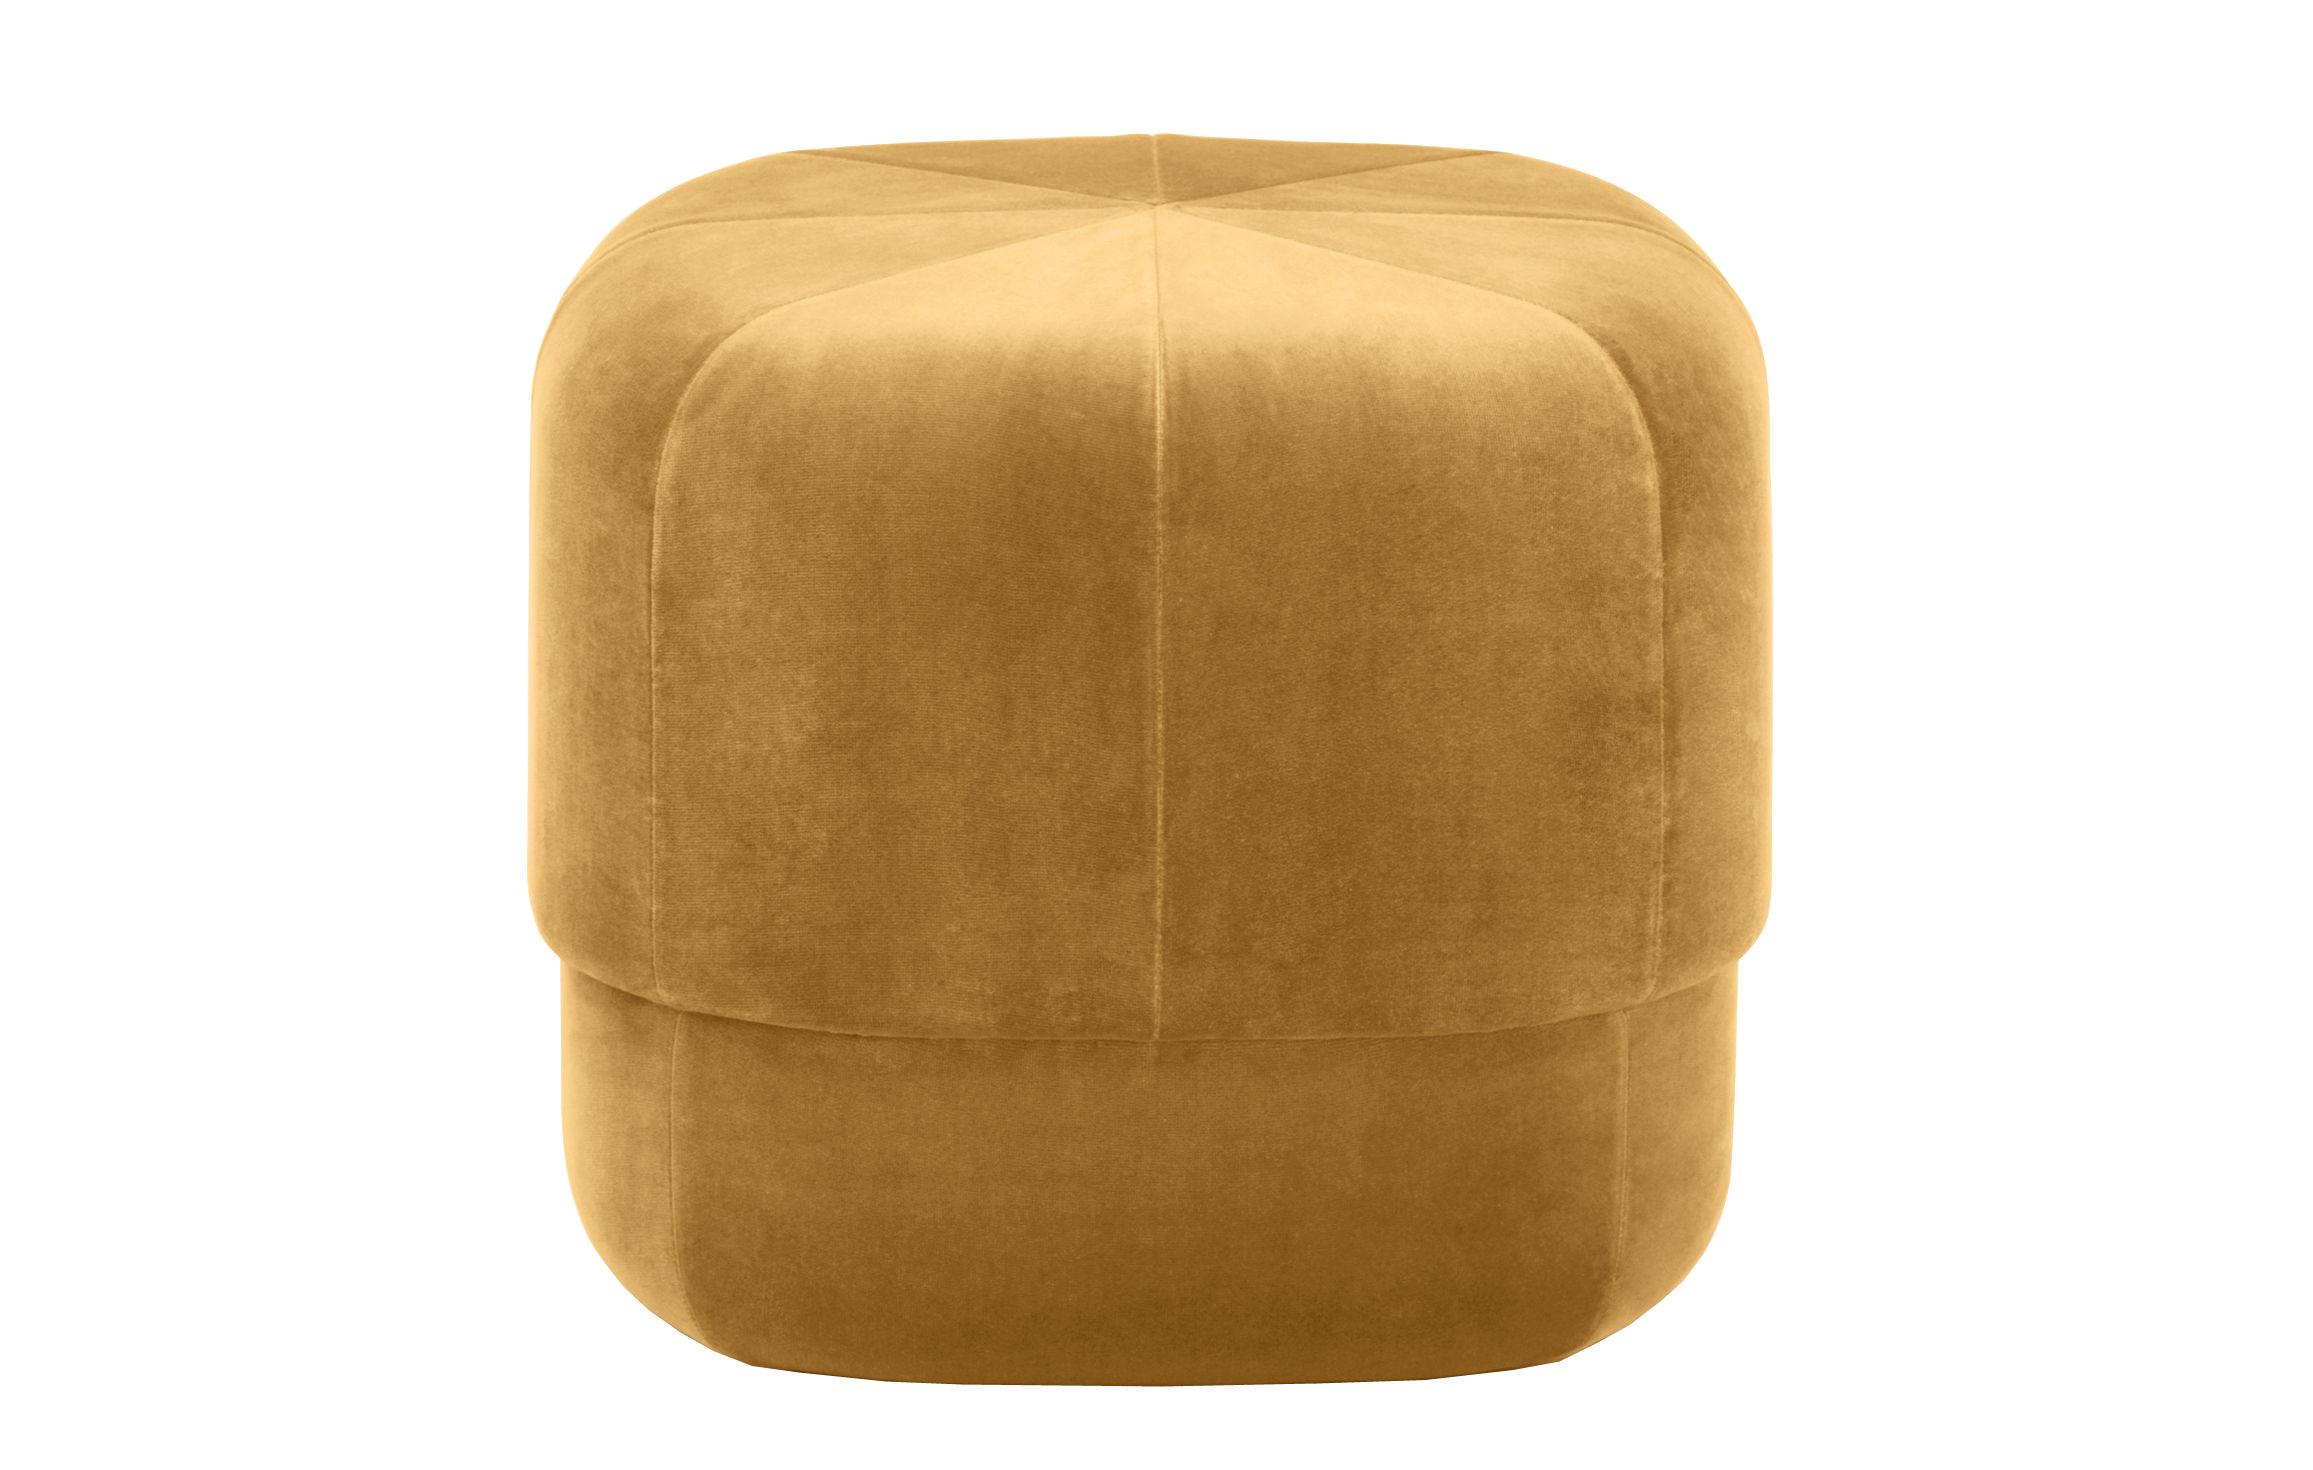 pouf circus small 46 cm velours jaune moutarde normann copenhagen. Black Bedroom Furniture Sets. Home Design Ideas